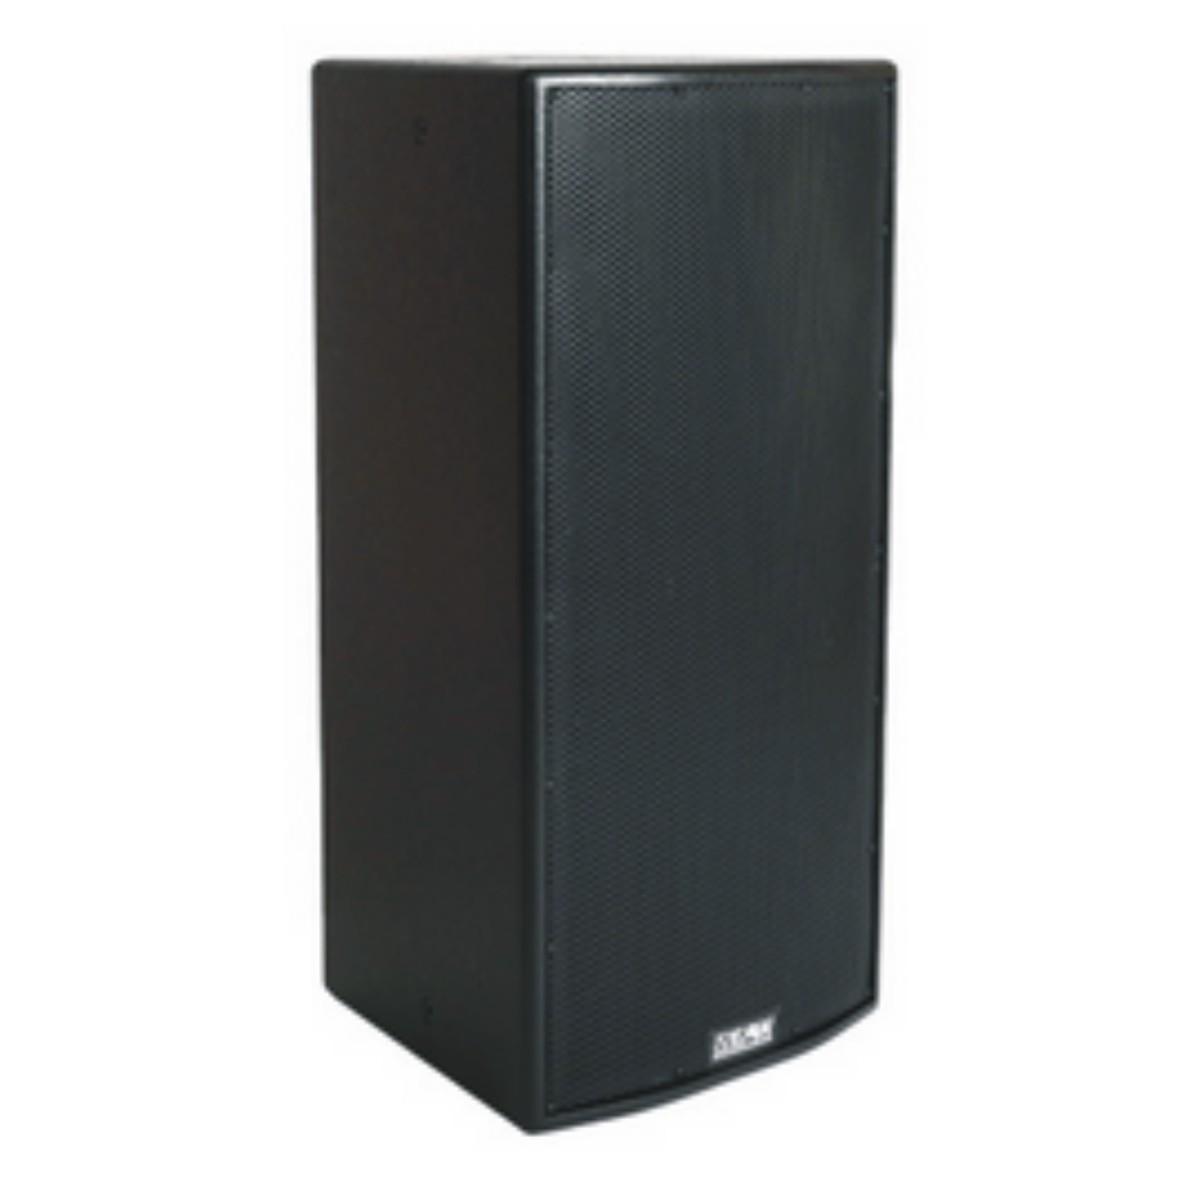 MK2394i 二分频高输出梯形音箱